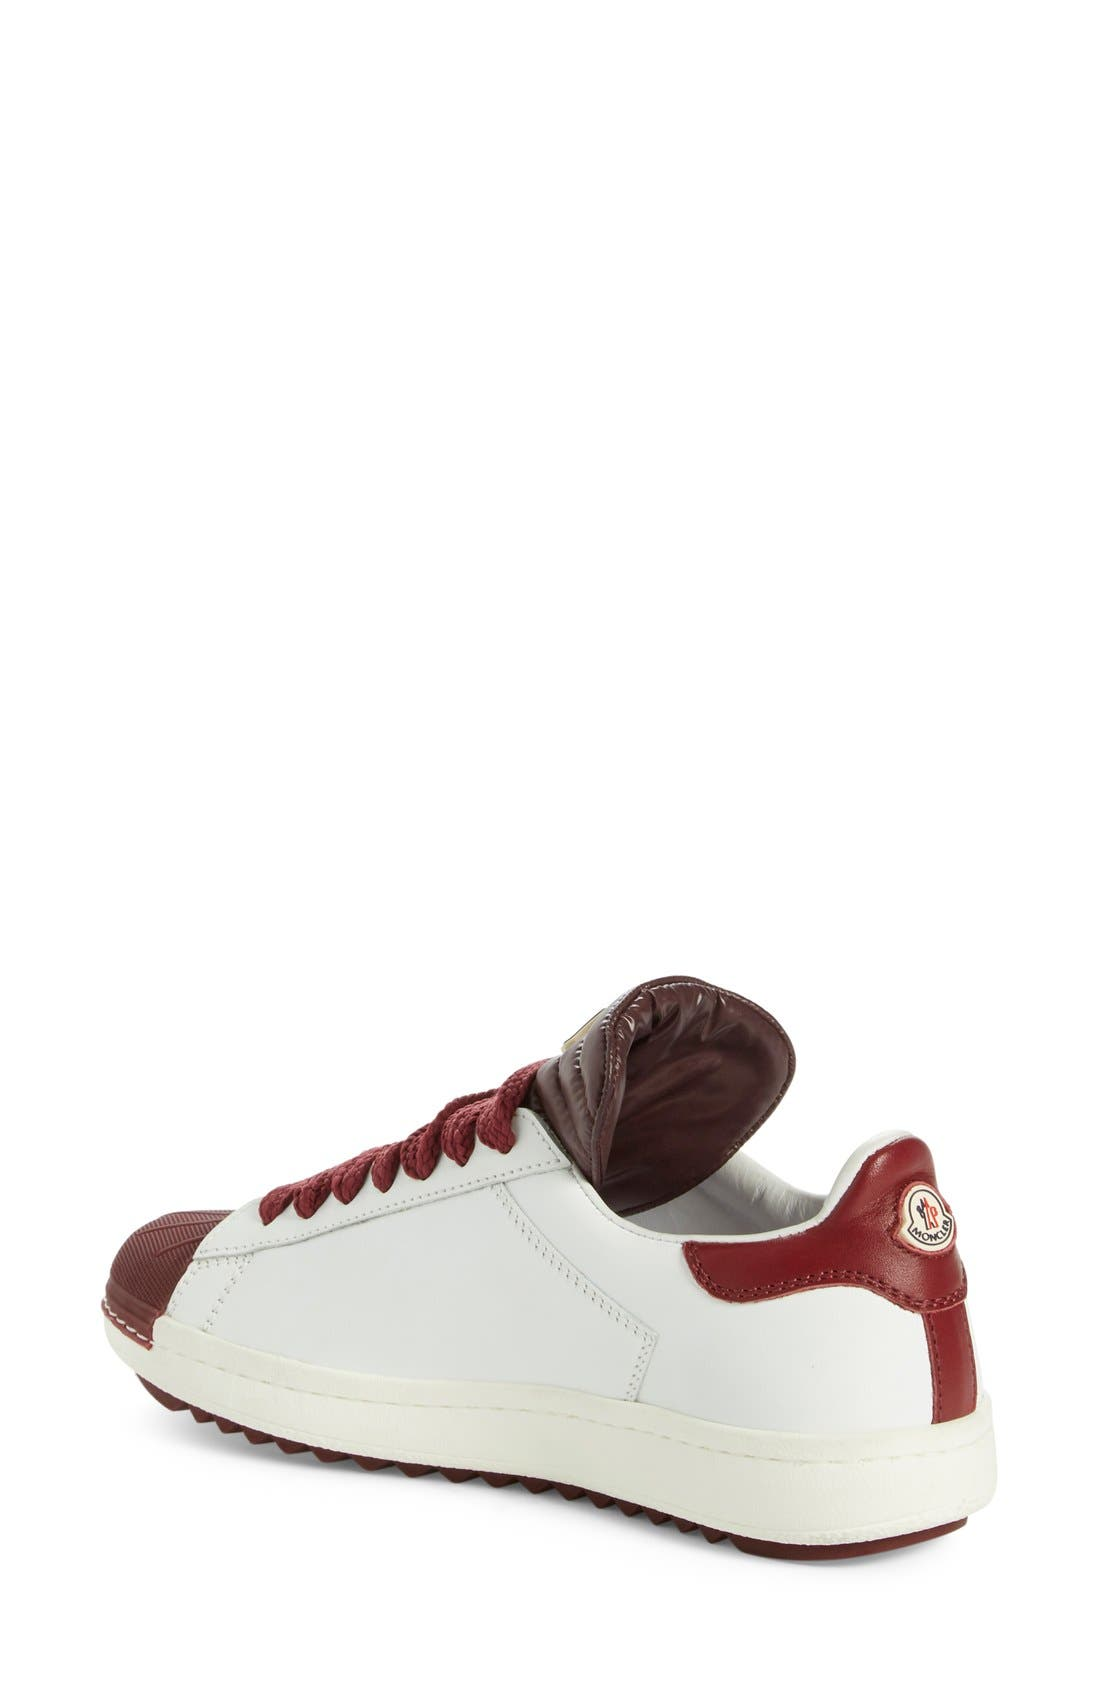 'Angeline Scarpa' Sneaker,                             Alternate thumbnail 2, color,                             Burgundy